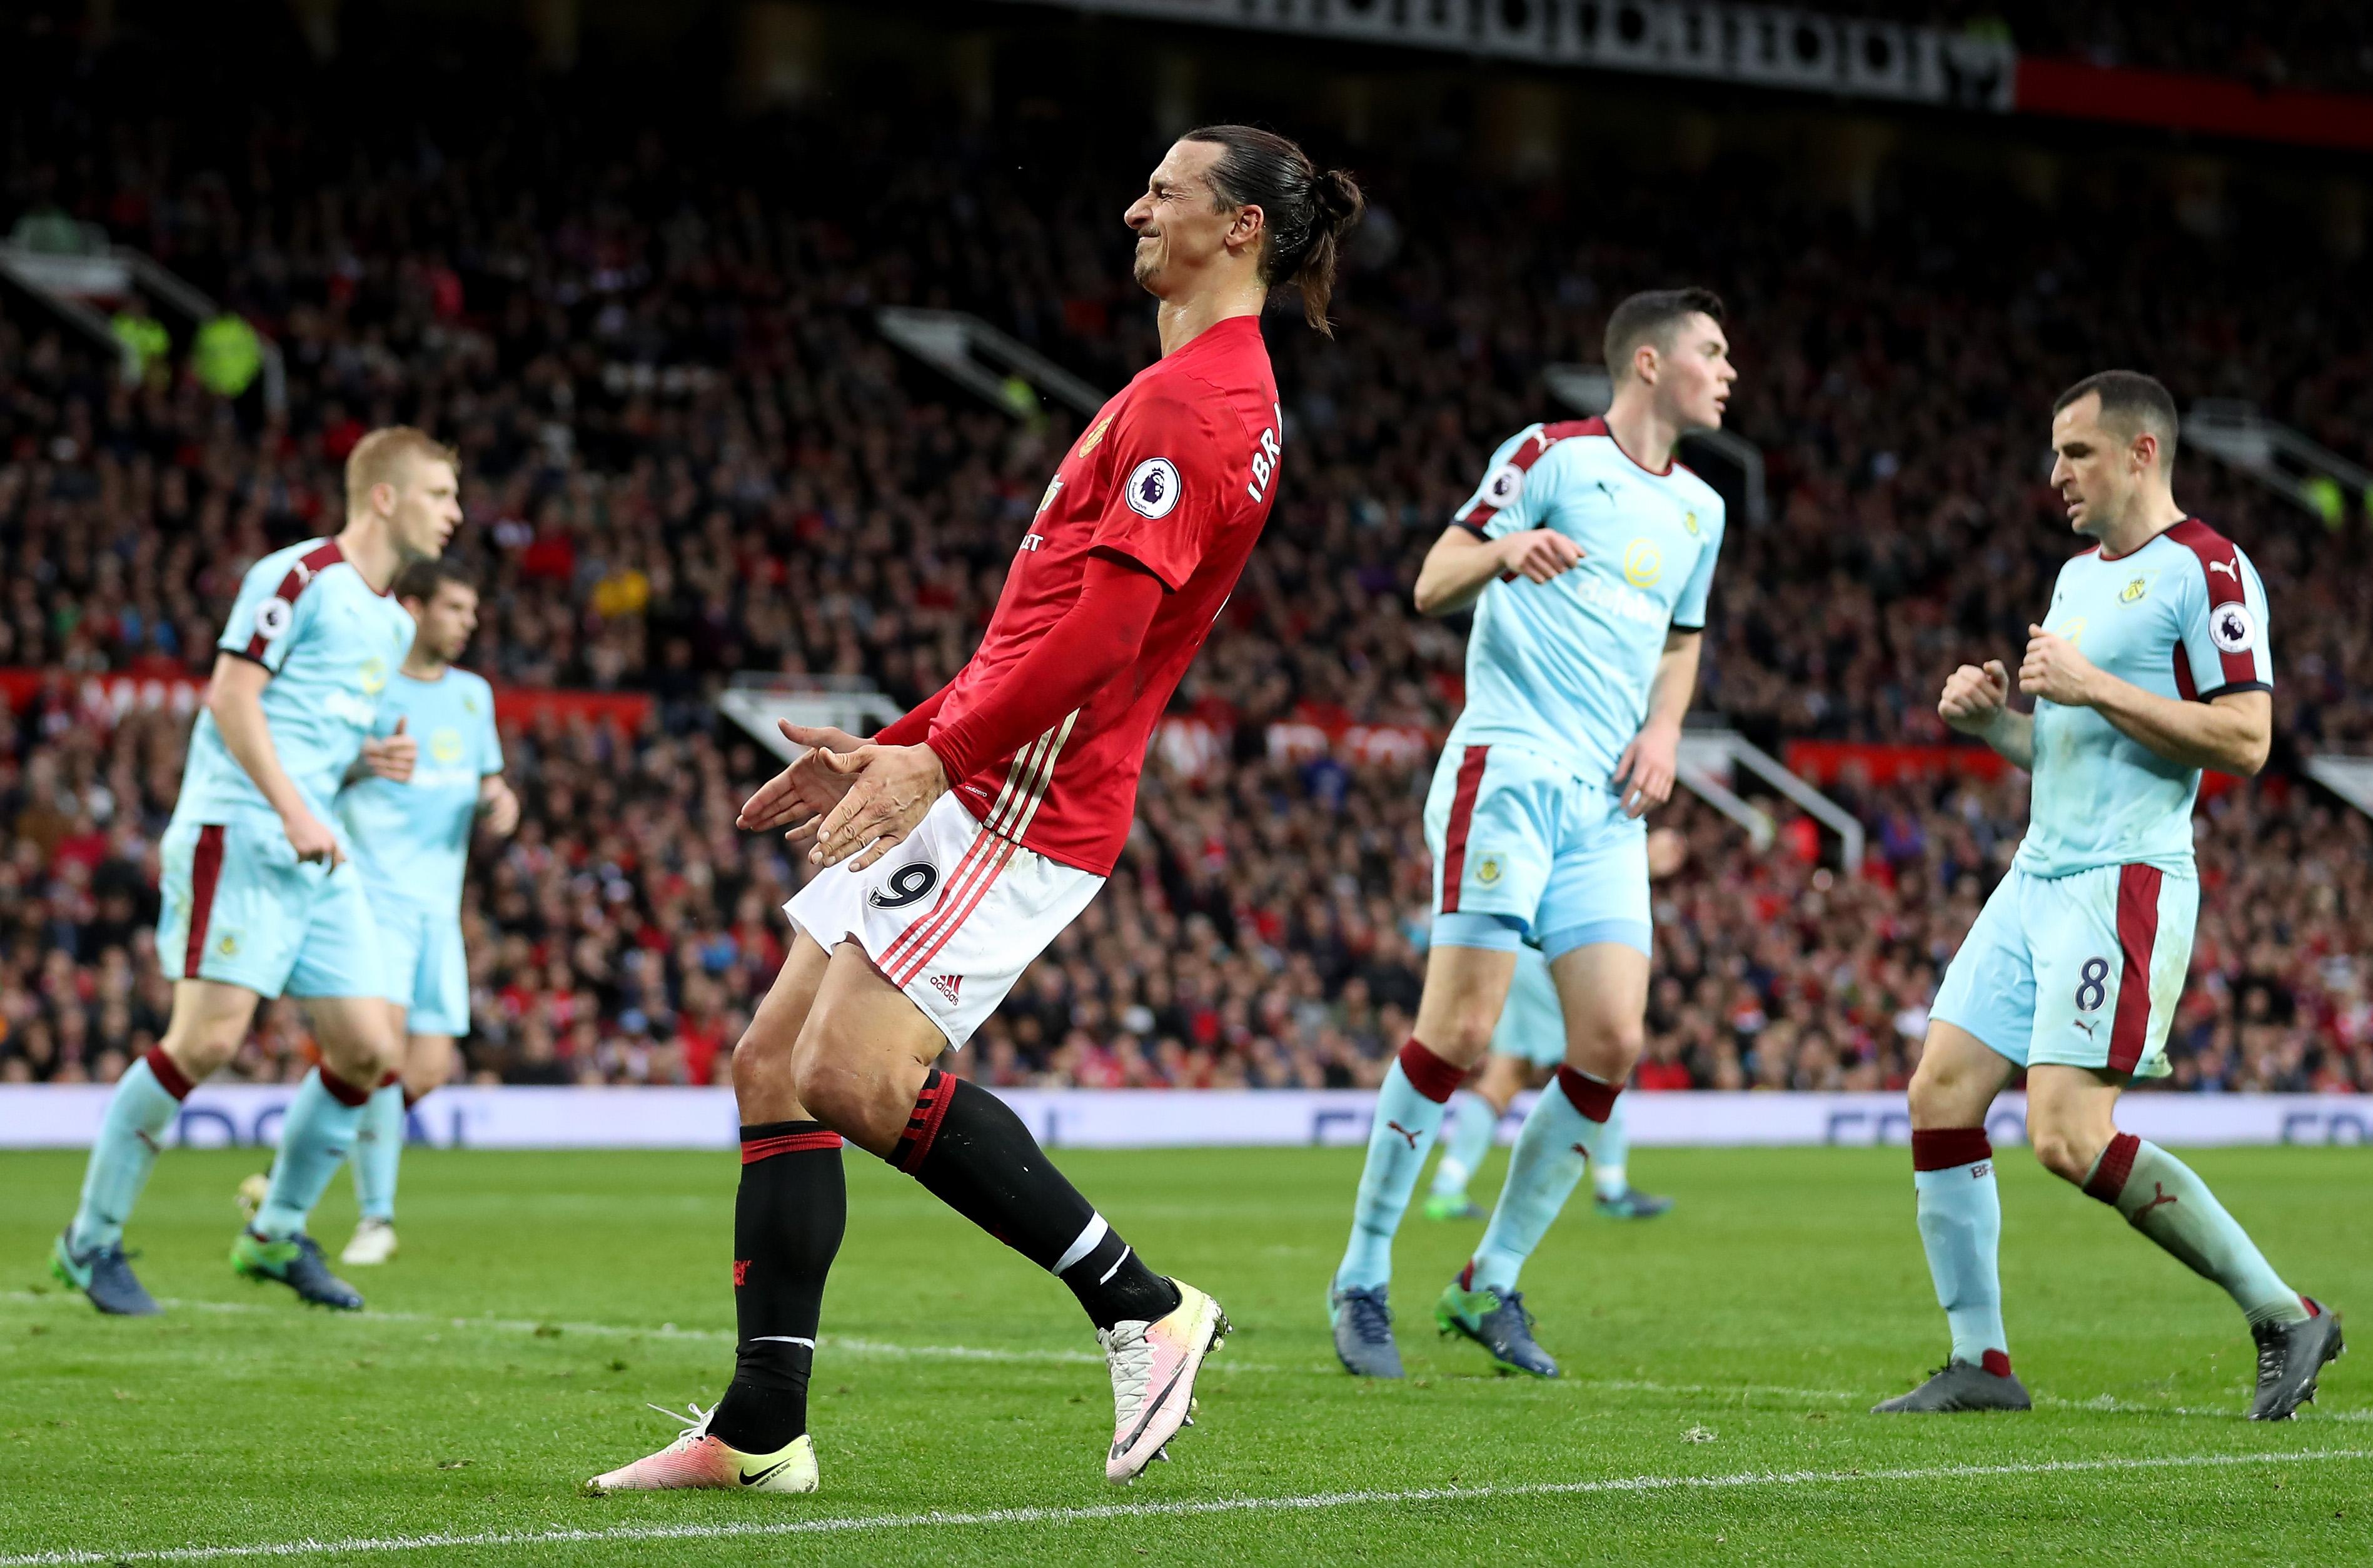 Прогноз на матч: Бернли – Манчестер Юнайтед – 2 сентября 2018 года